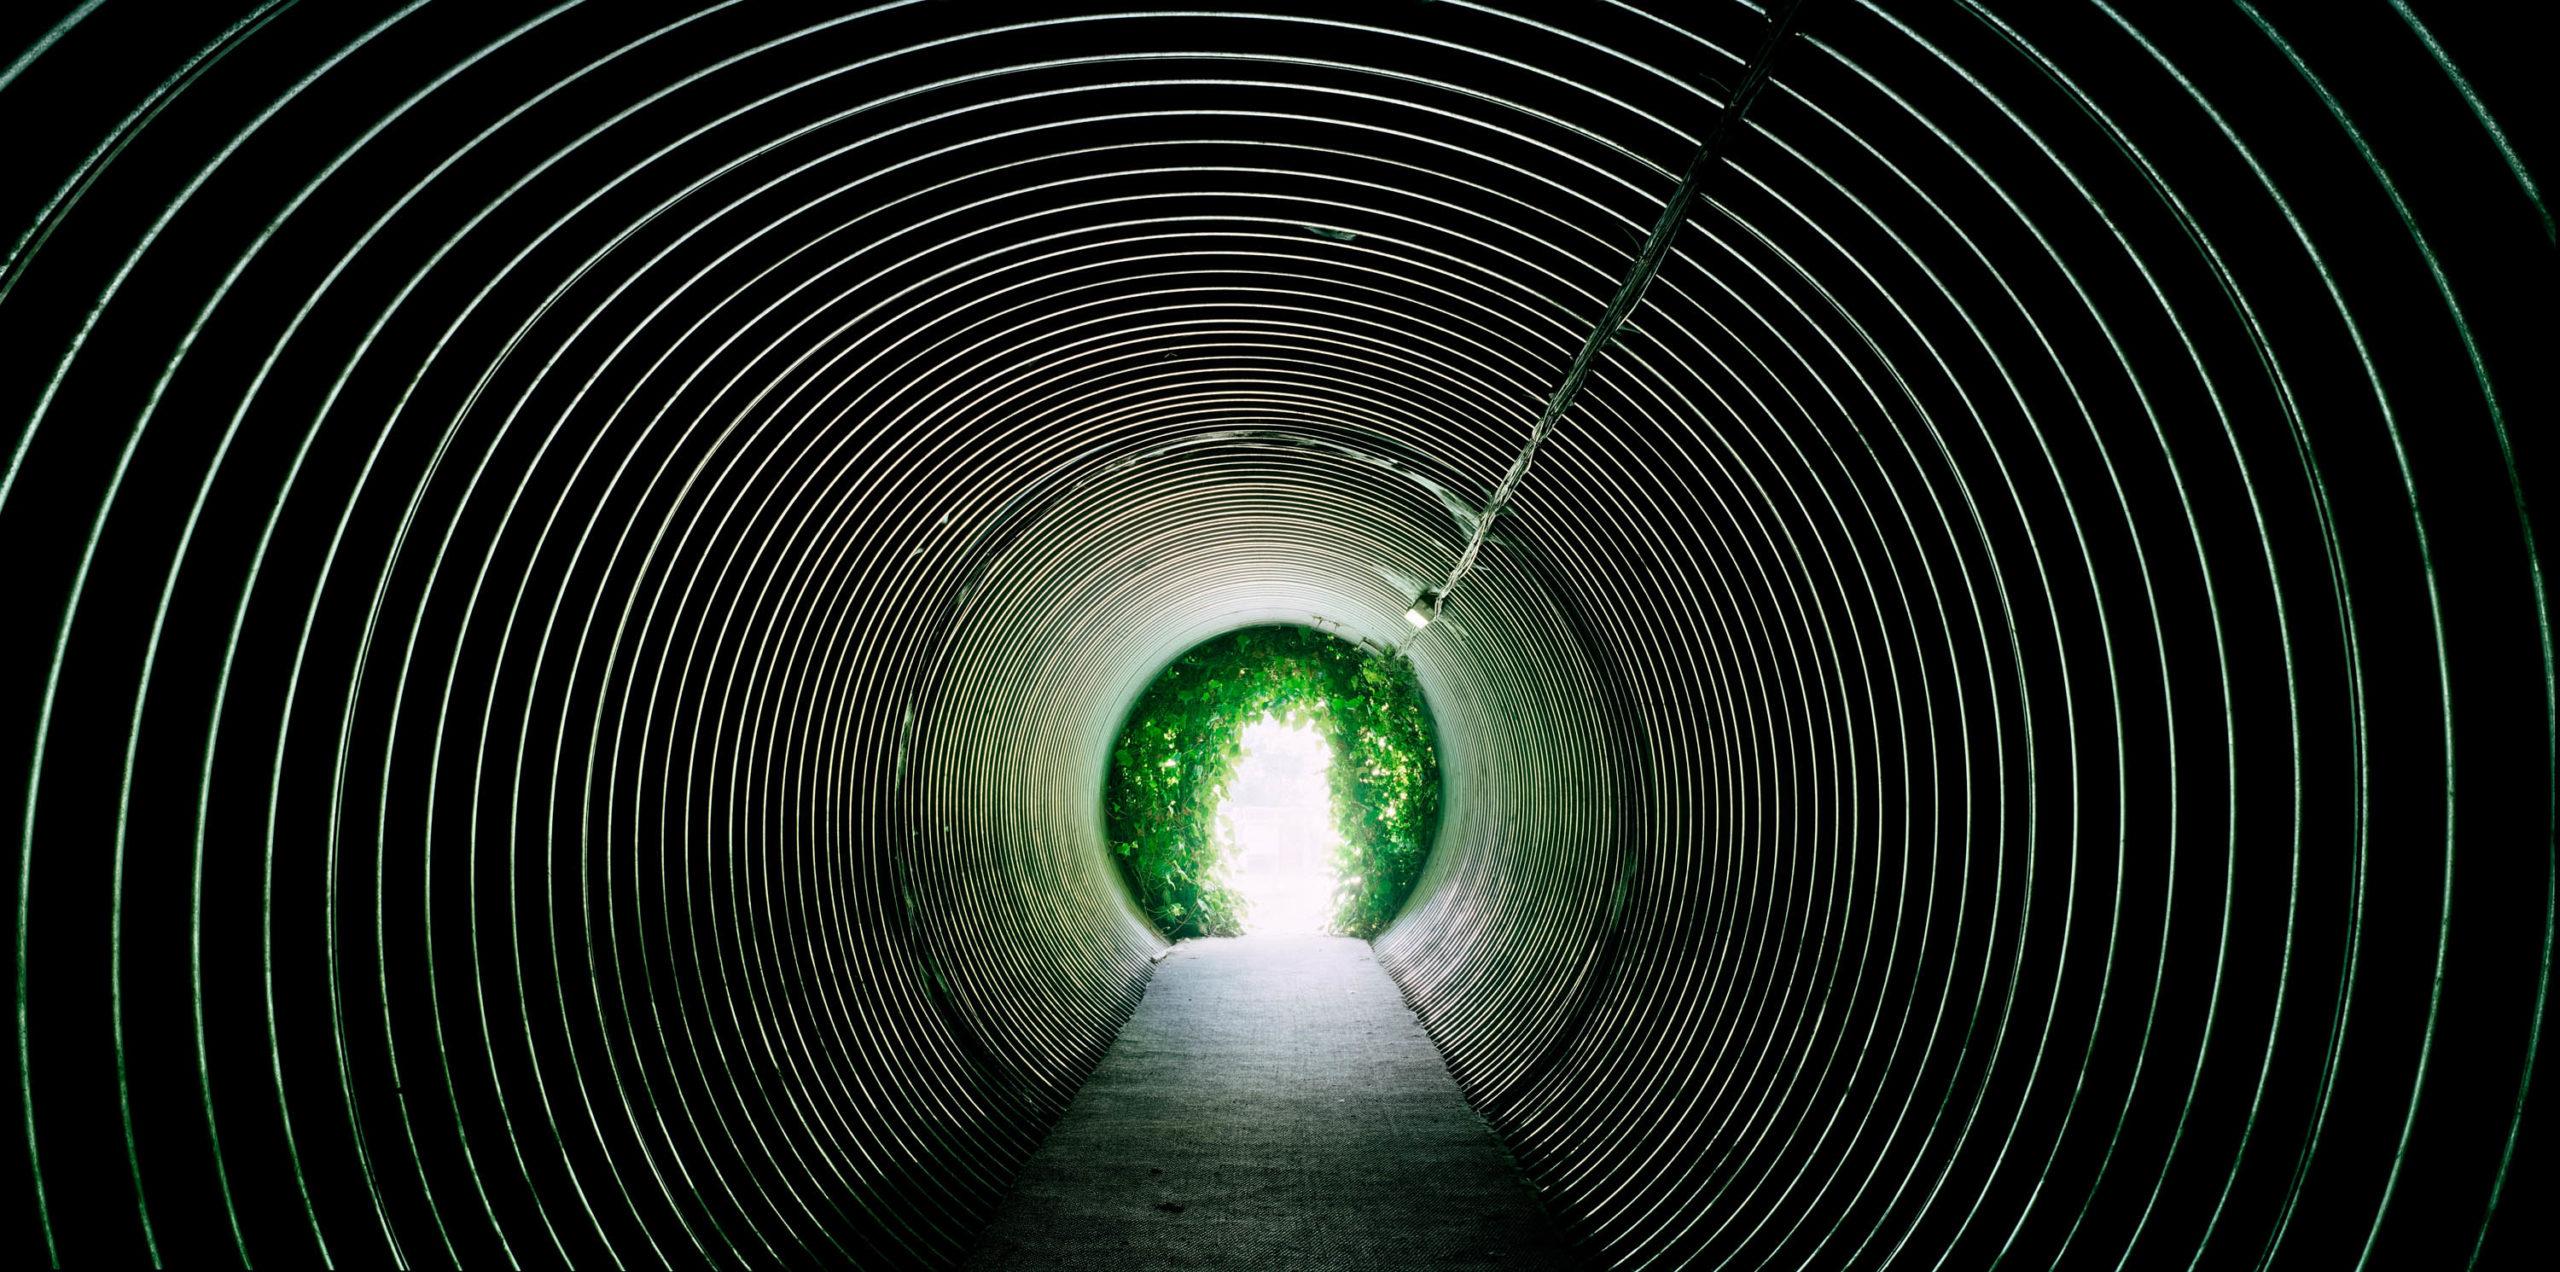 United Kingdom. Exit of an underground bunker